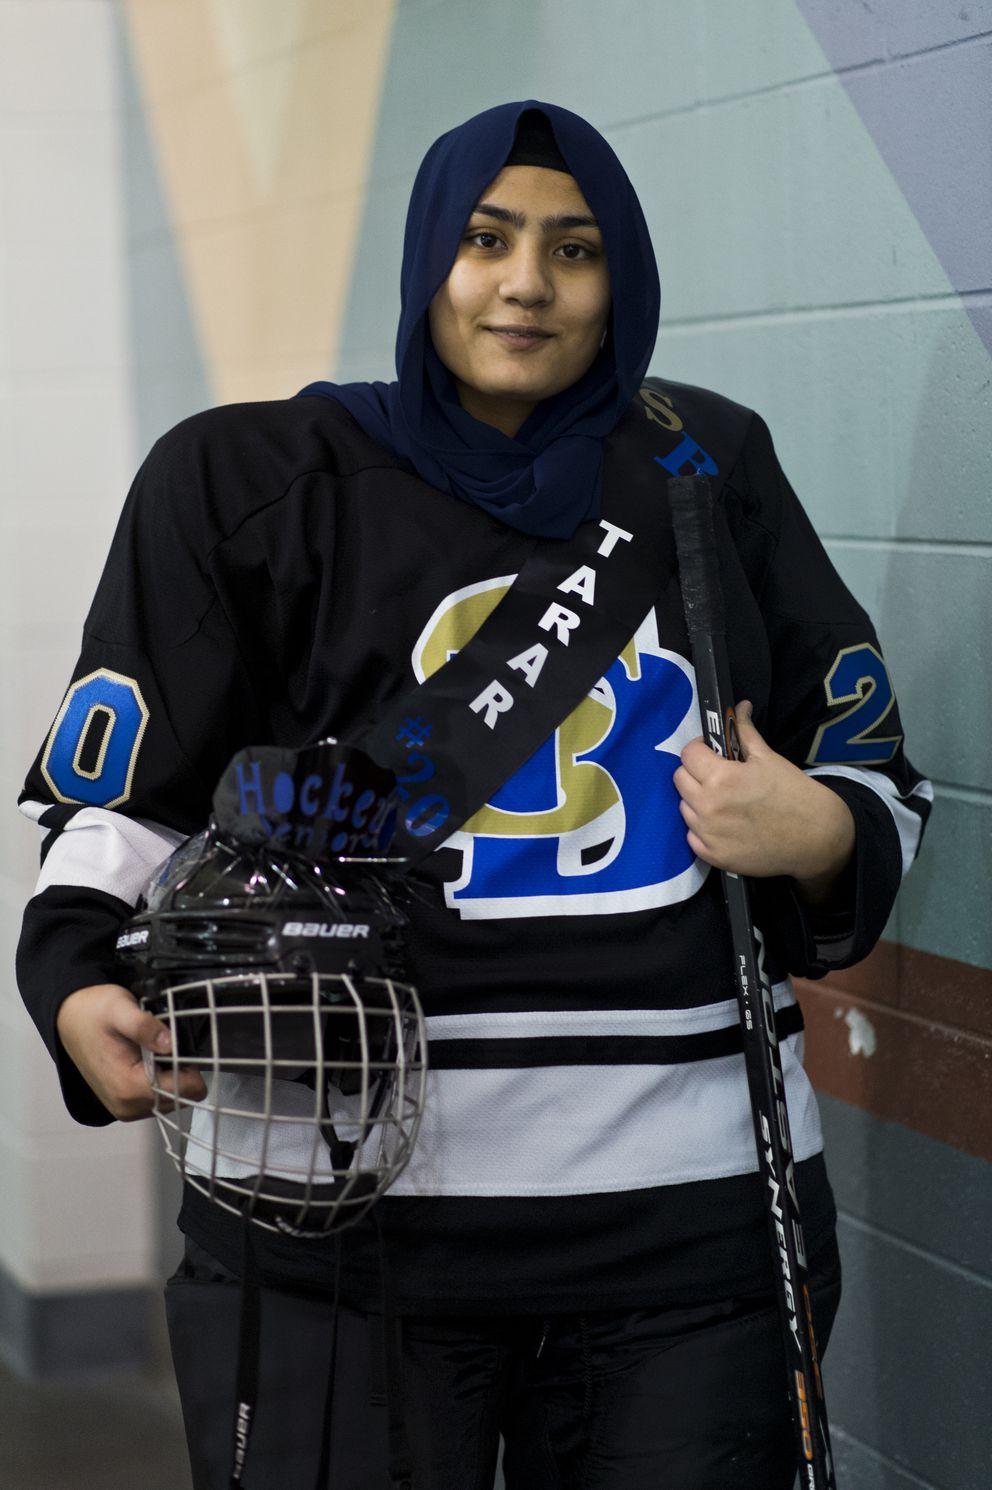 Leena Tarar, of Khewra, Pakistan, plays for the South/Bartlett JV hockey team on January 25, 2019. (Marc Lester / ADN)